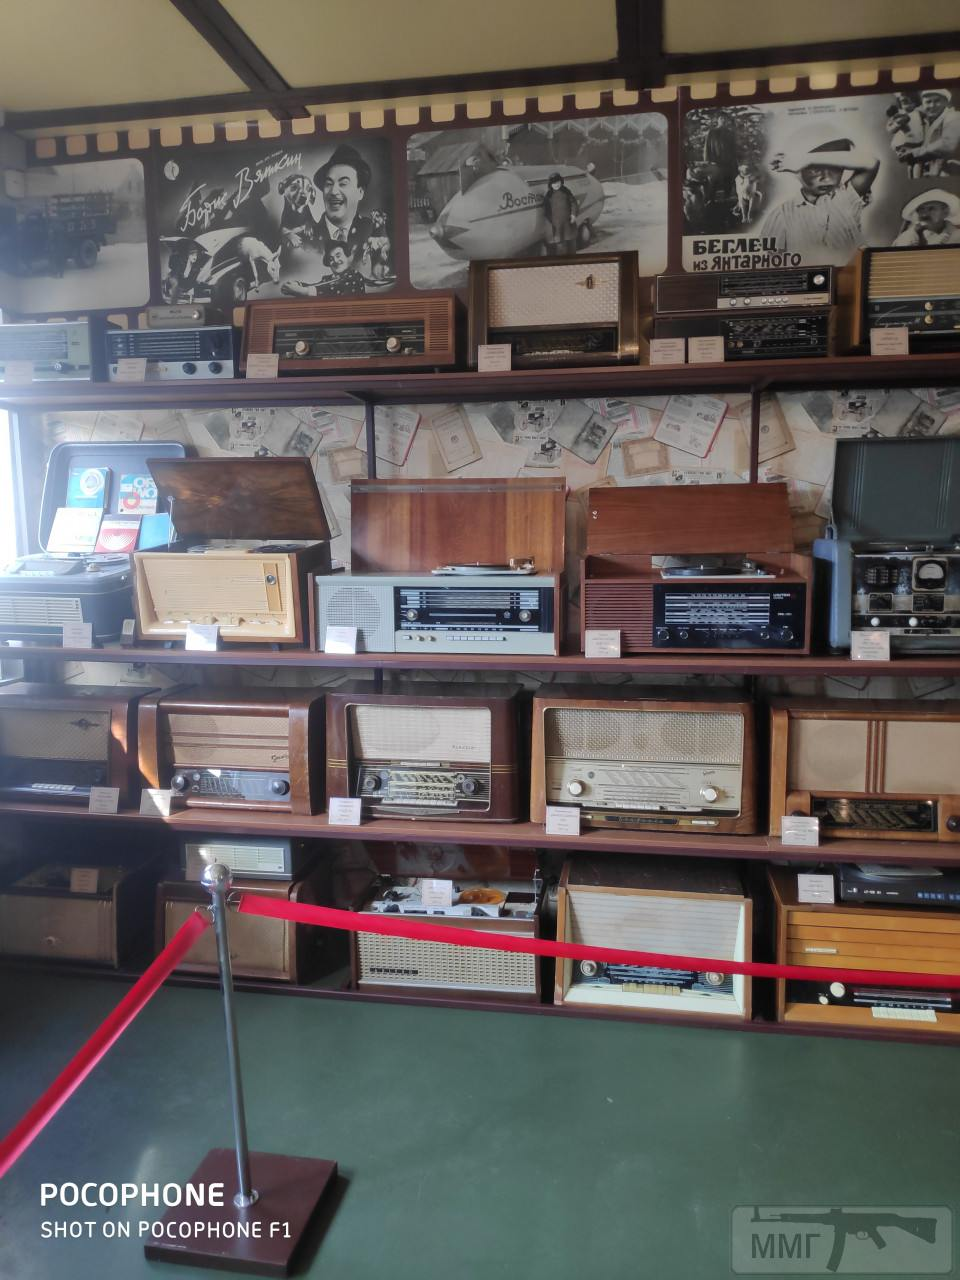 71125 - Музей техники Фаэтон в г. Запорожье